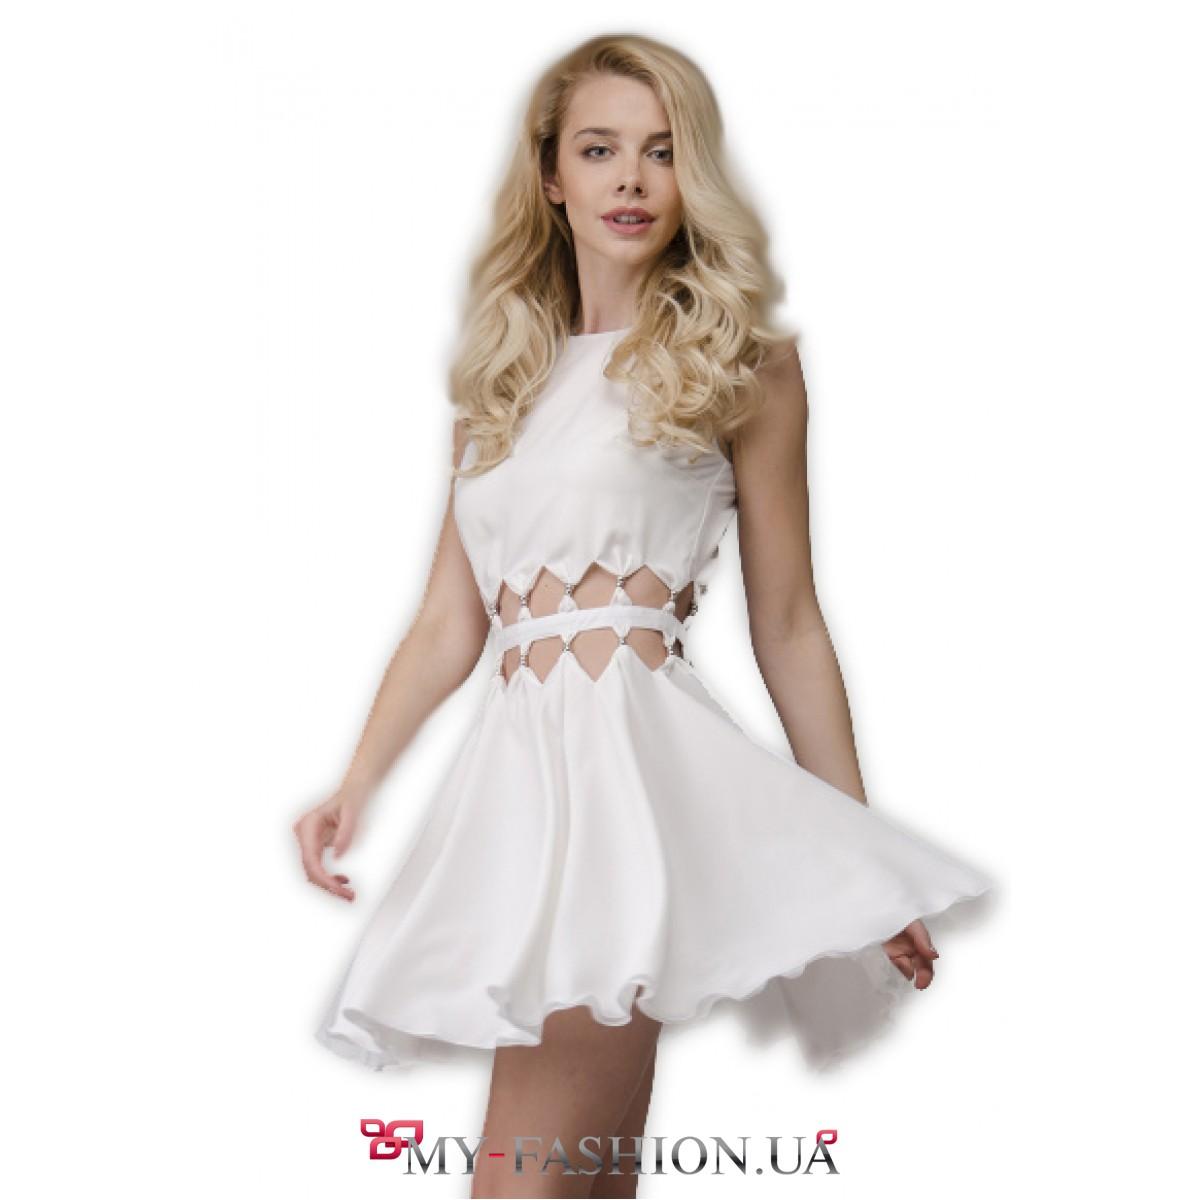 Молочное платье короткое